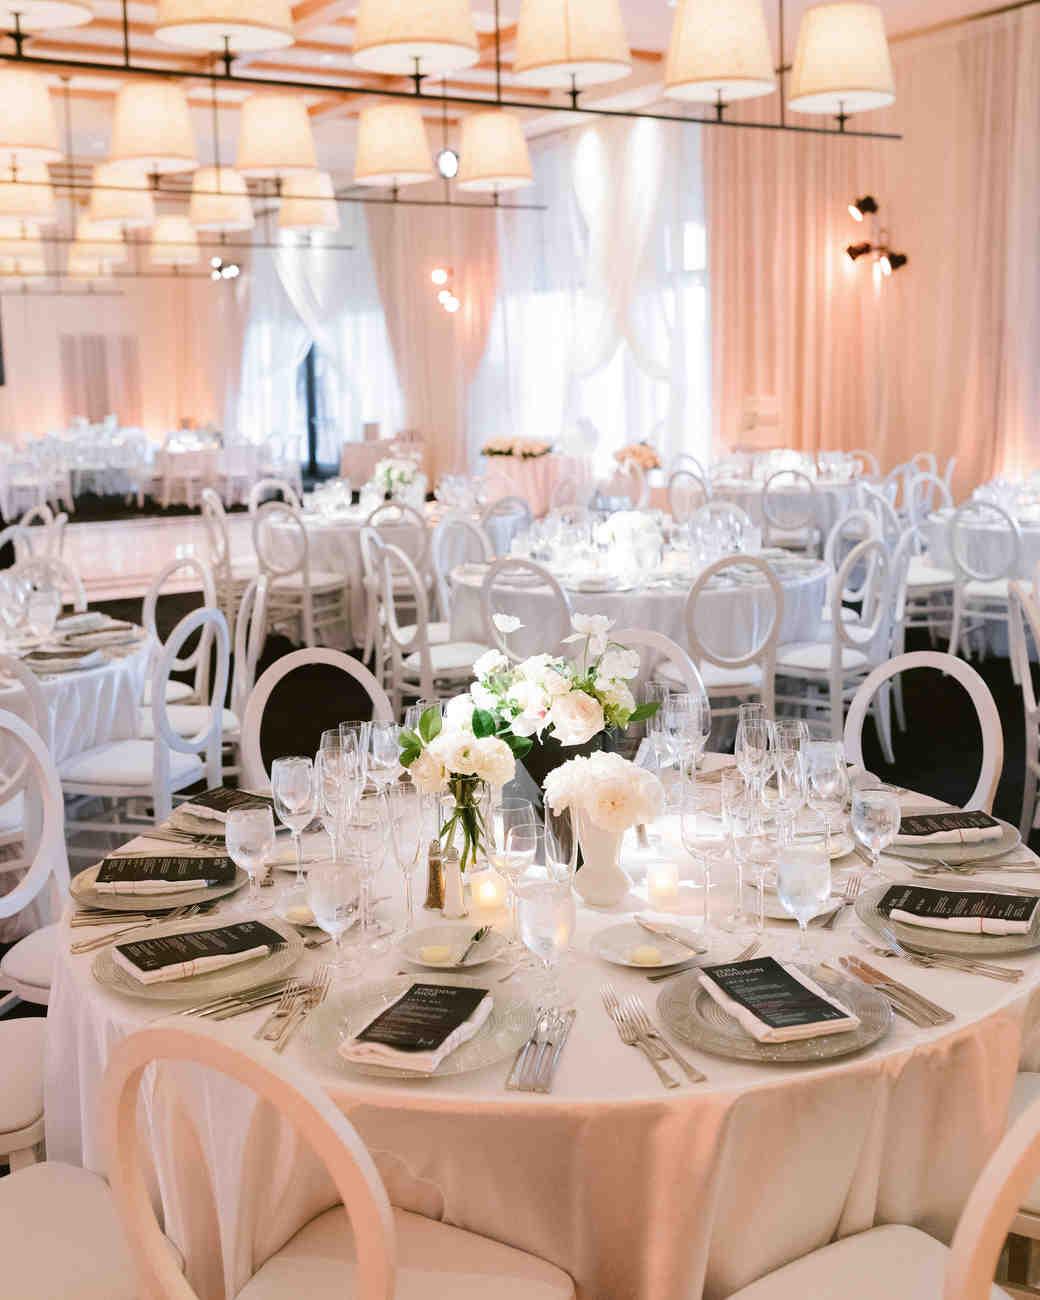 henery michael wedding reception tables